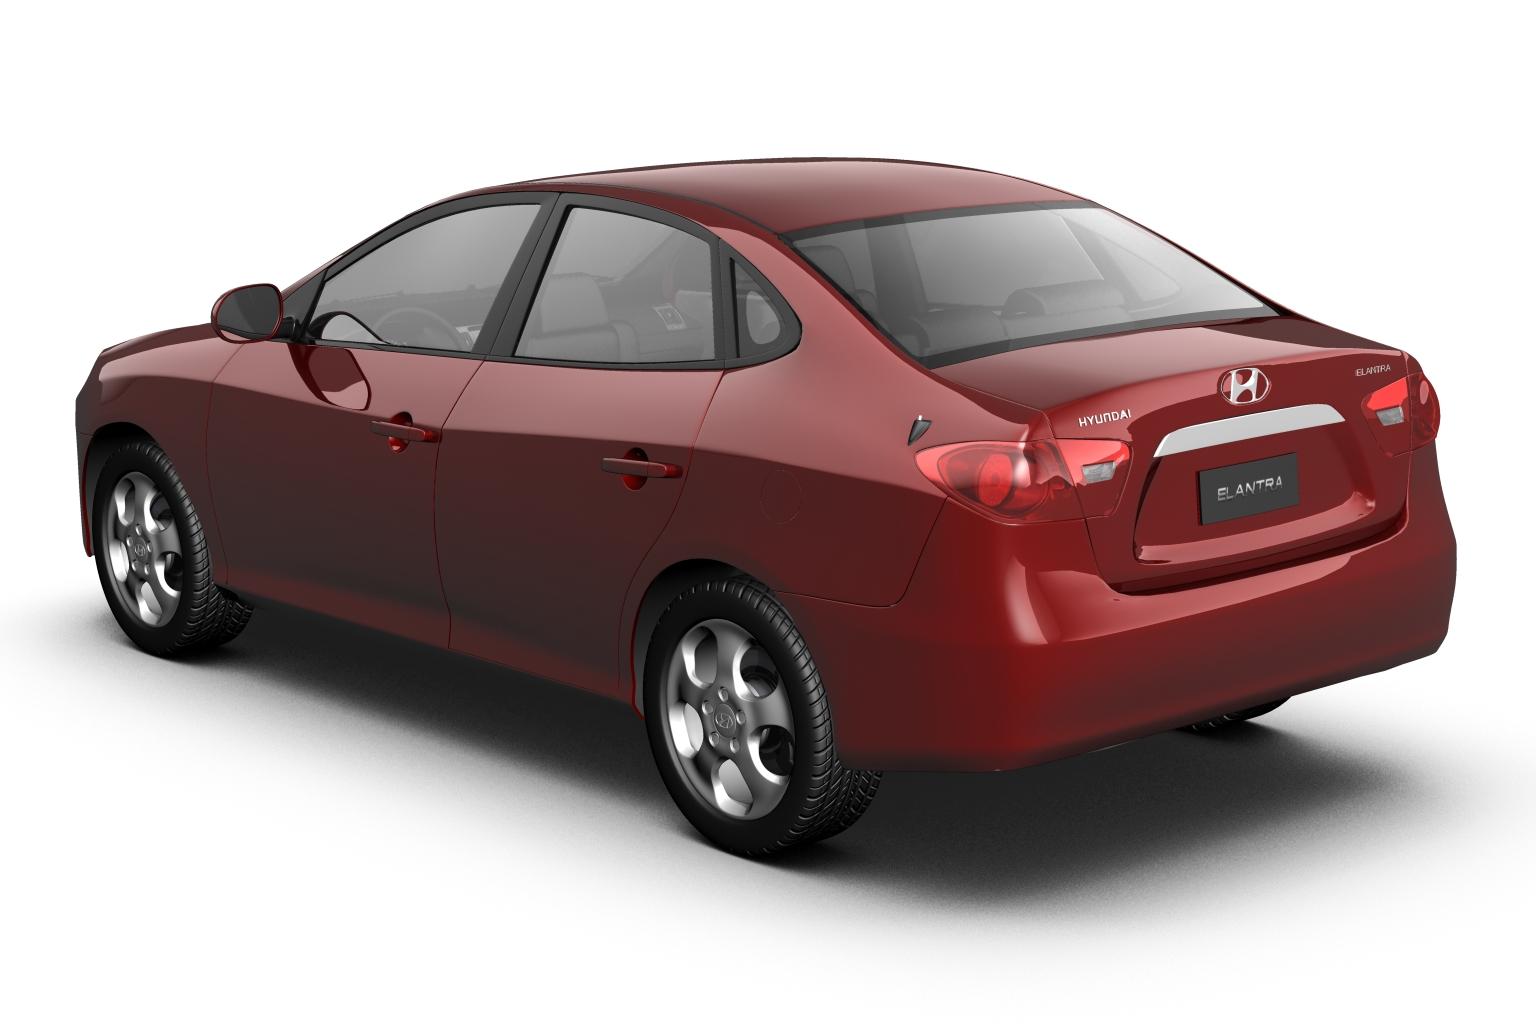 2007 hyundai elantra (avante) Model 3d 3ds max fbx lwo hrc xsi obj 205404